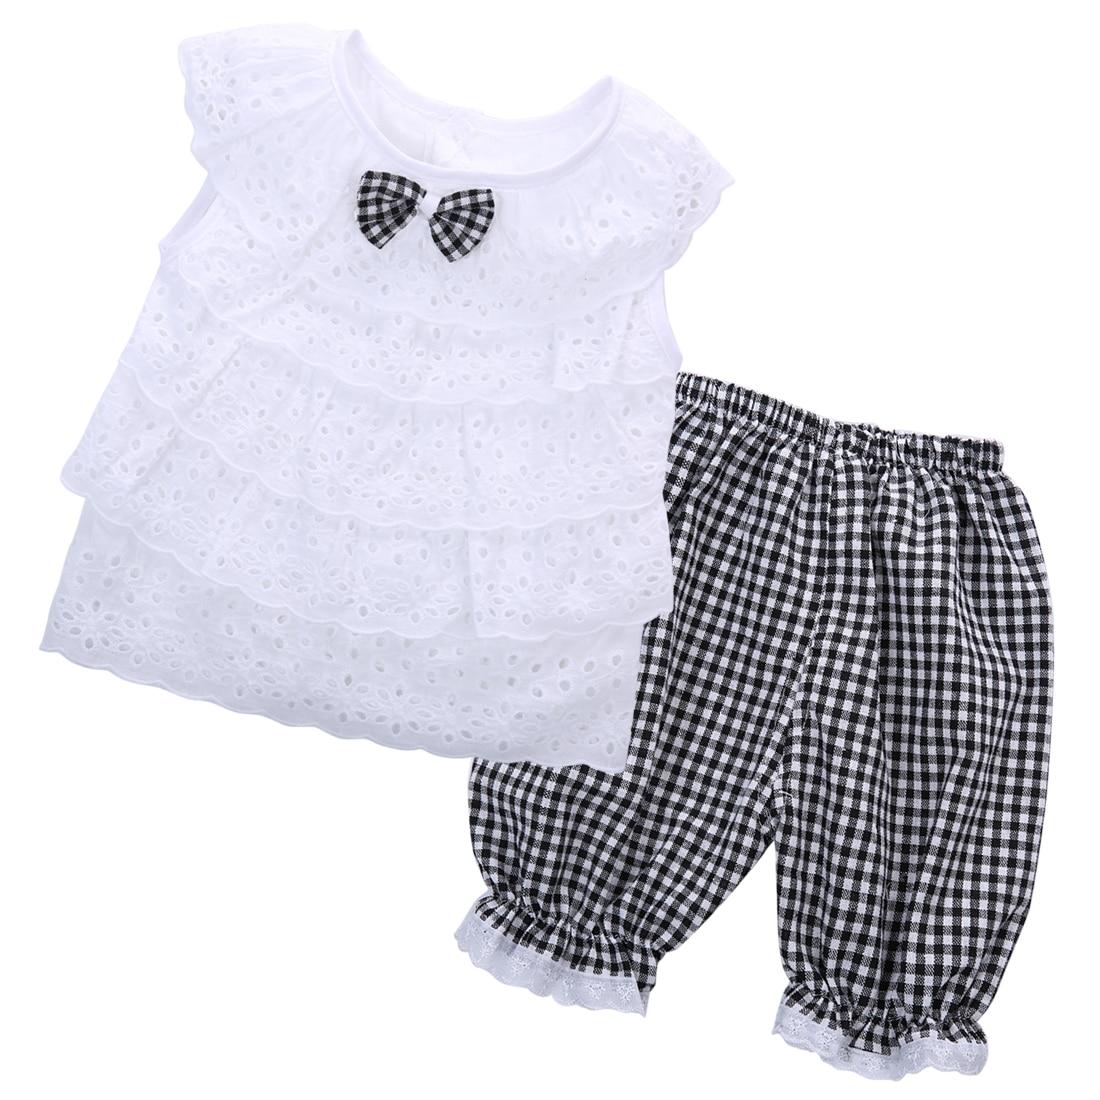 2017 Newest Baby Girls font b clothes b font font b USA b font font b online buy wholesale usa kids clothes from china usa kids clothes,Childrens Clothes Usa